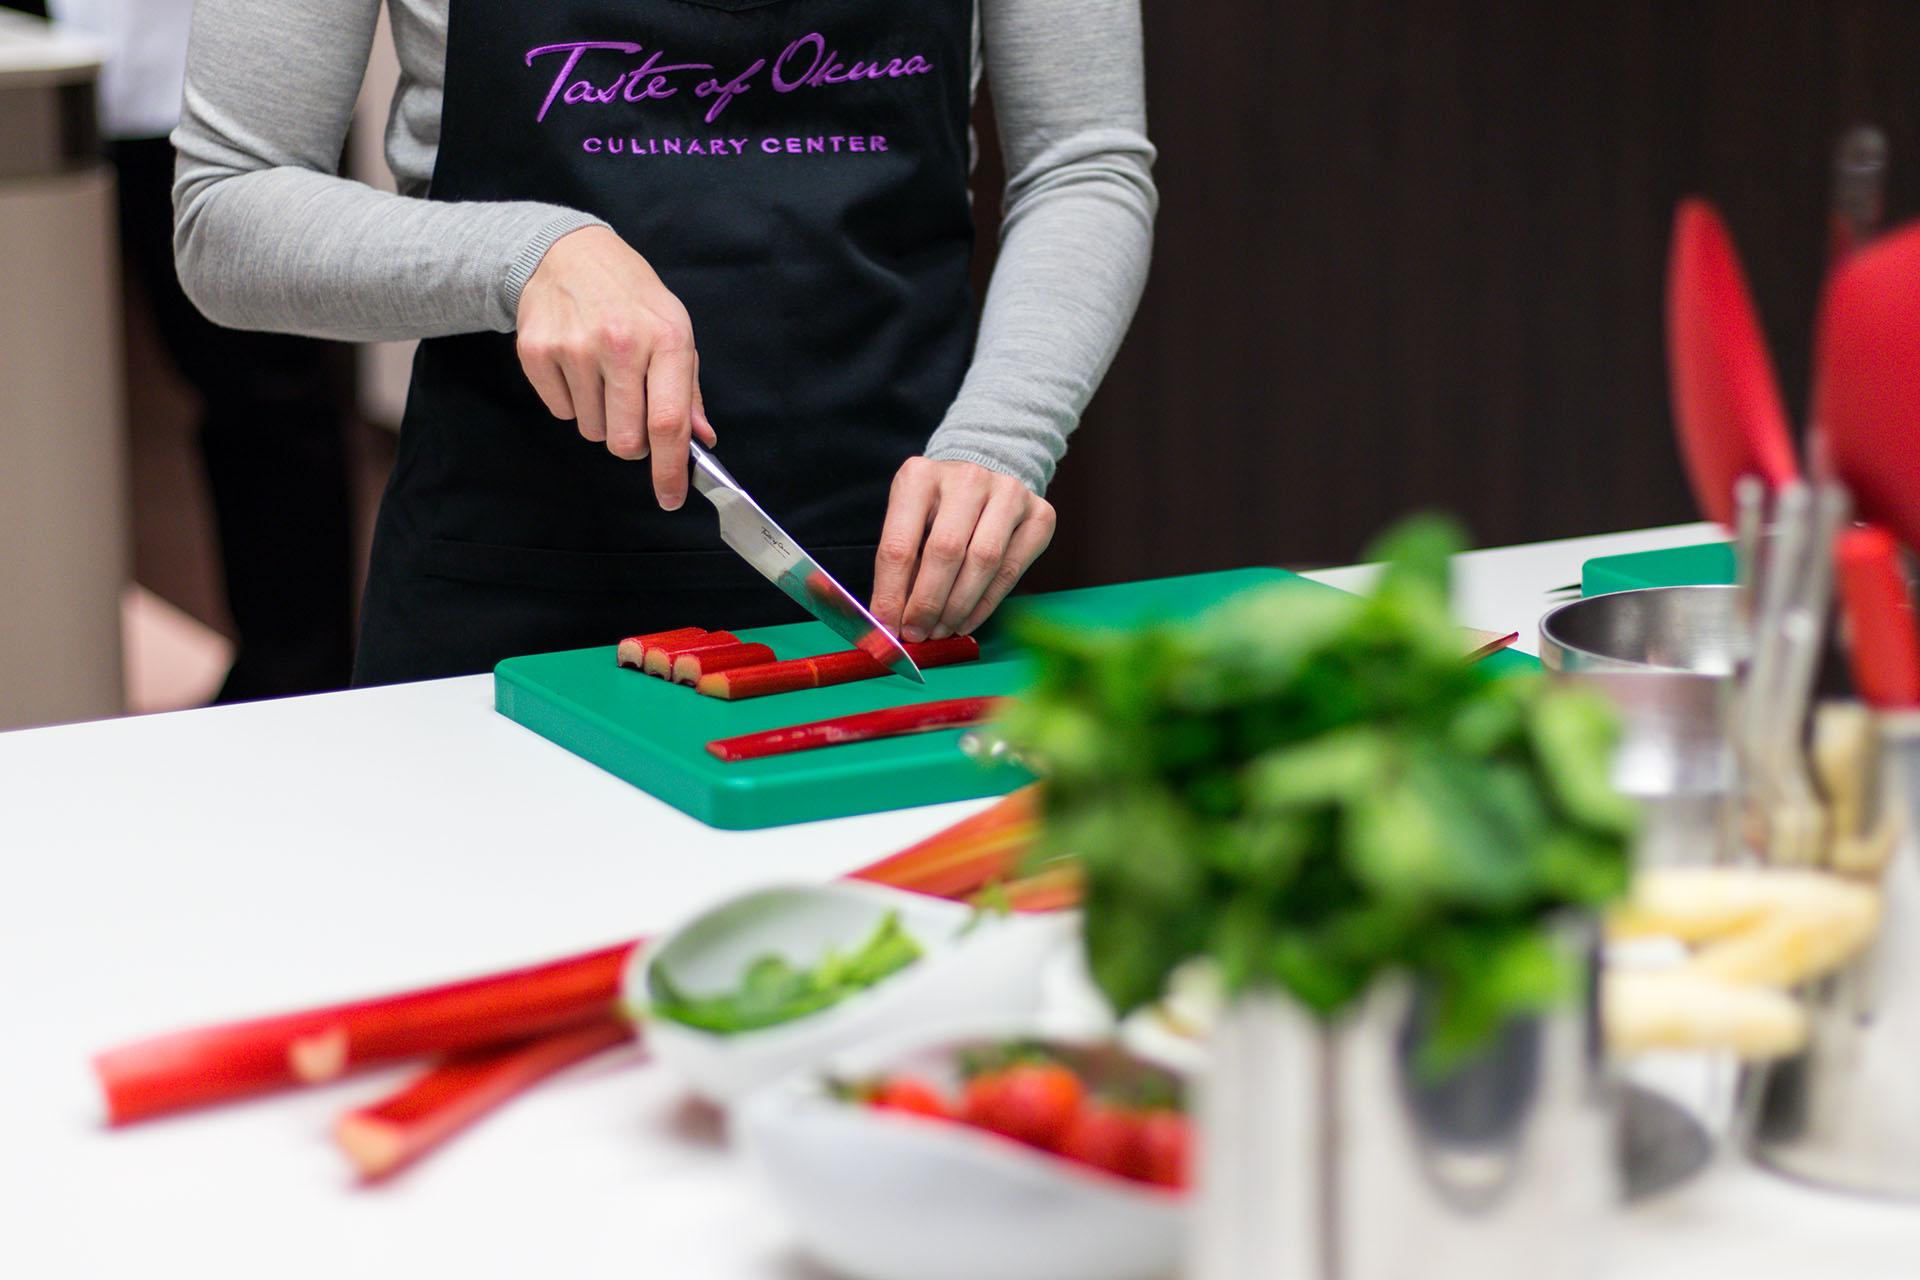 Cutting during workshop Taste of Okura